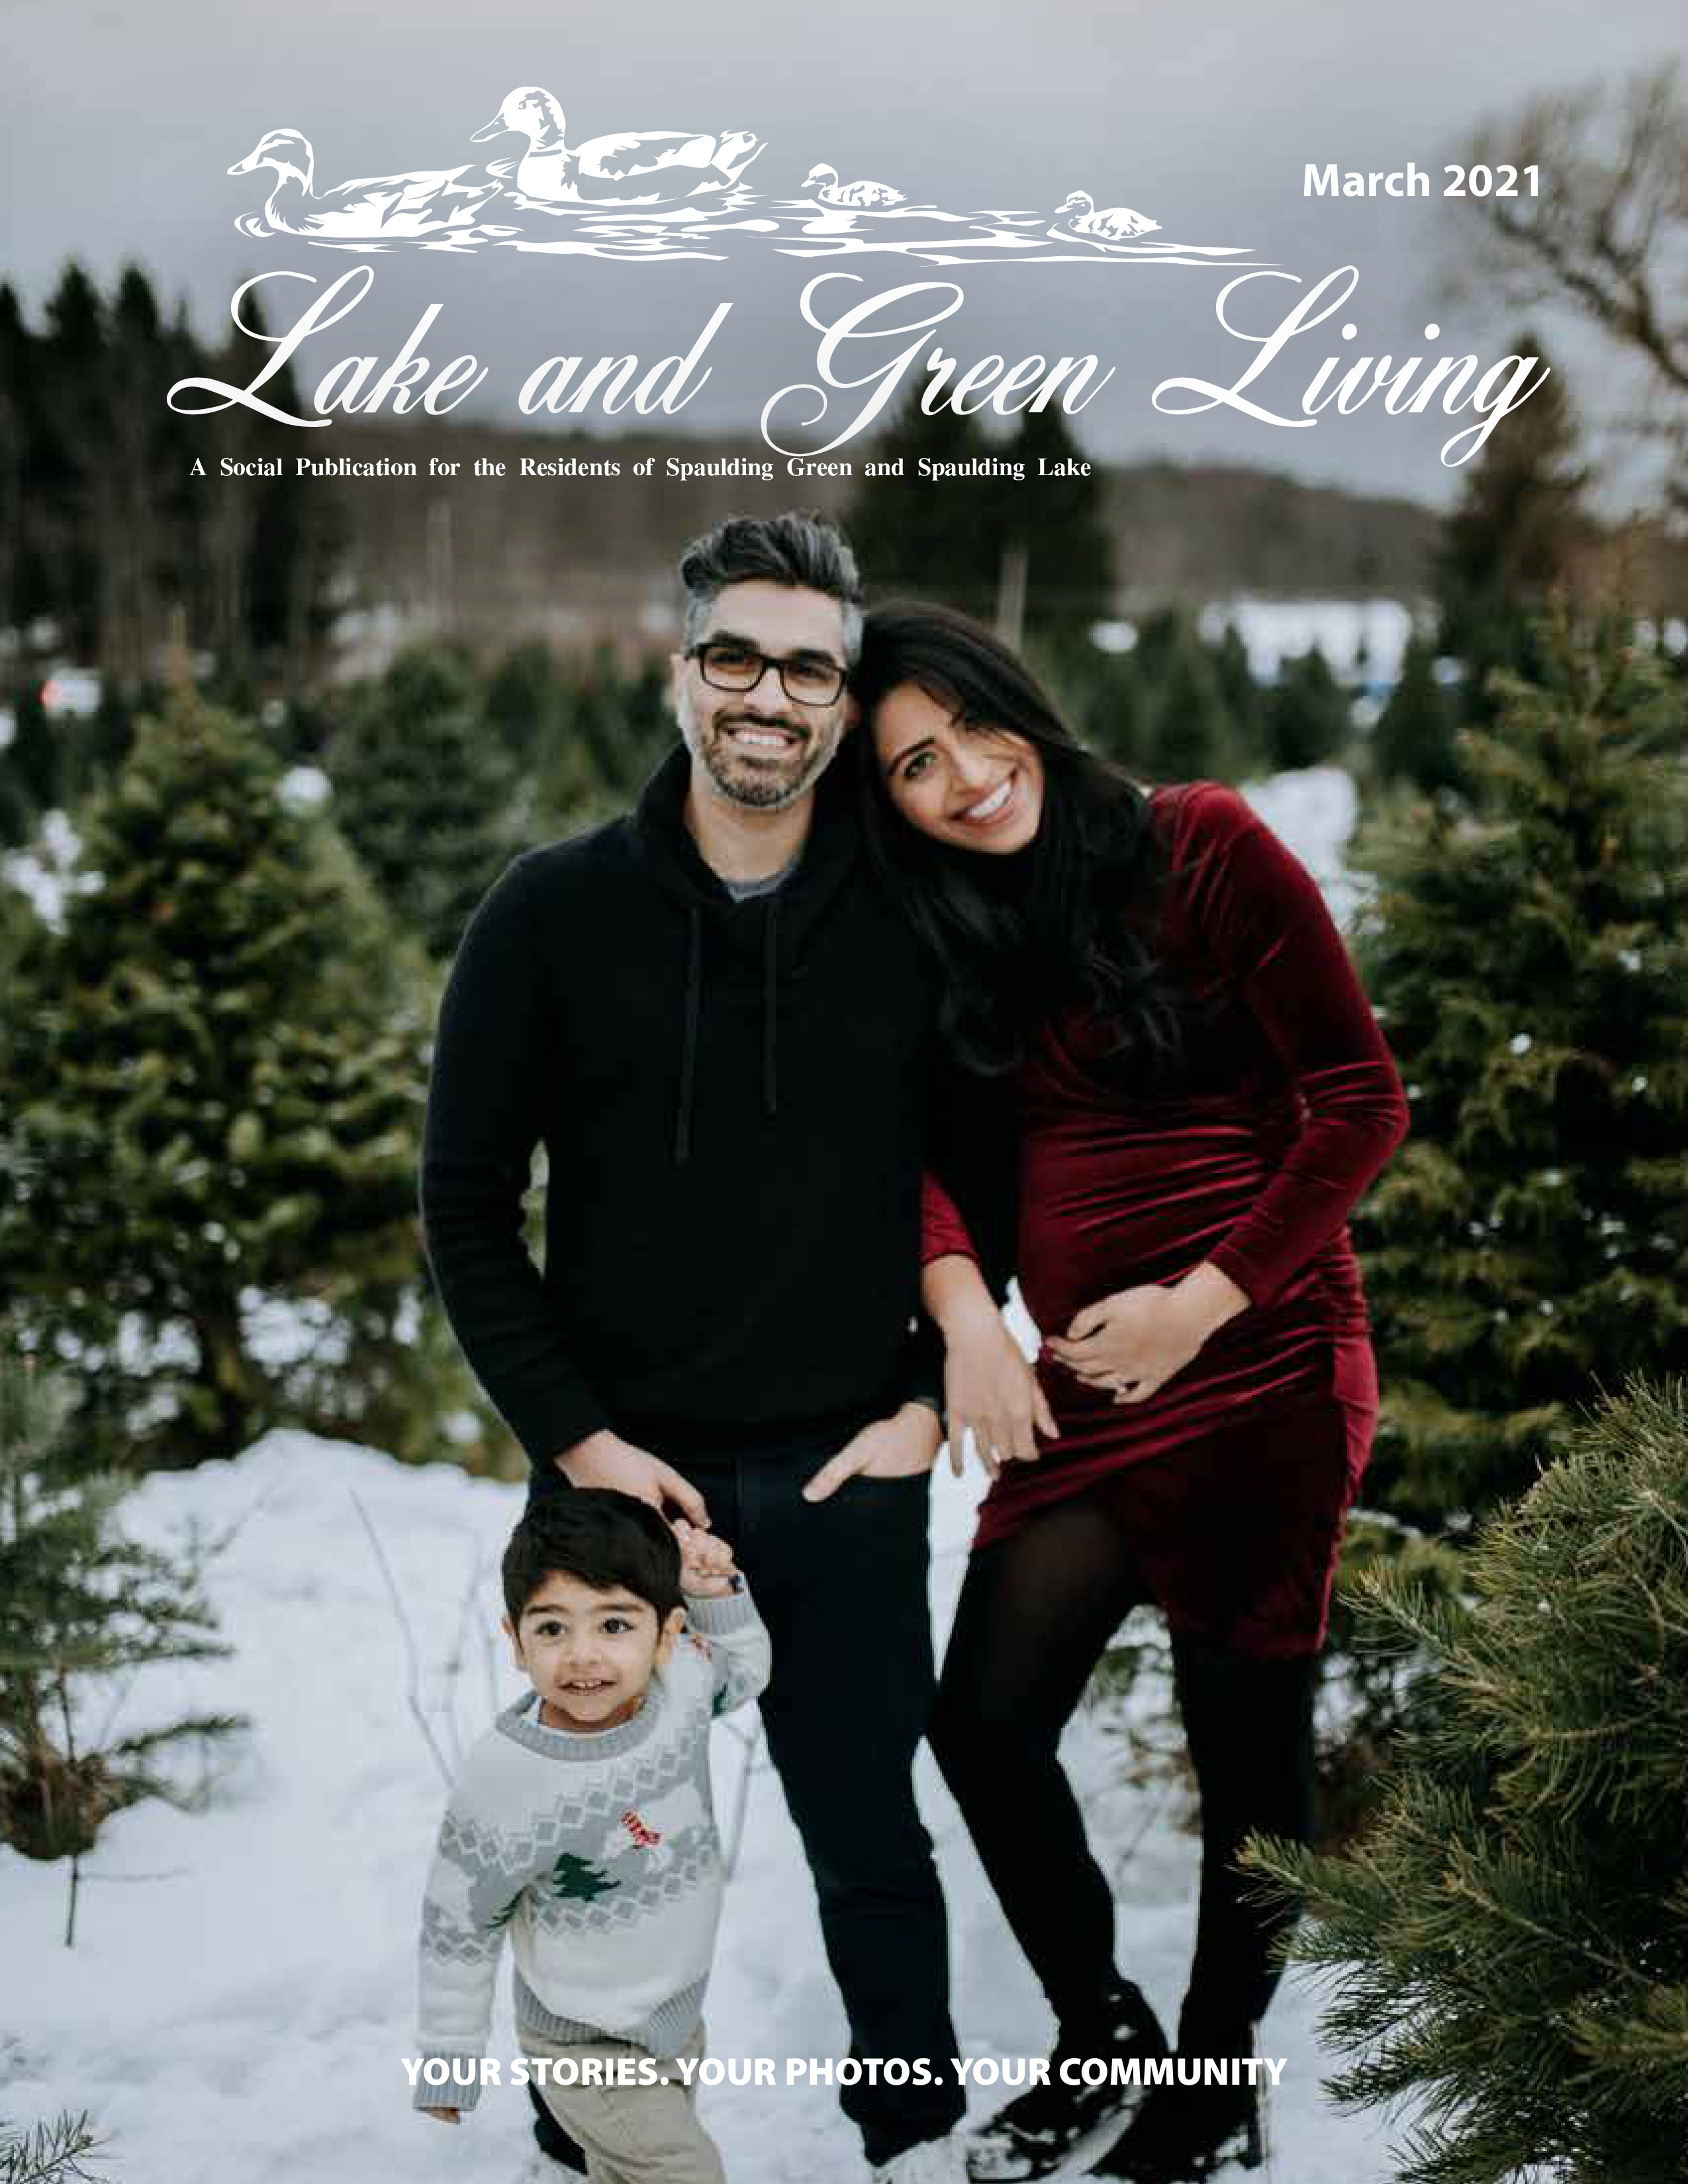 Lake and Green Living 2021-03-01